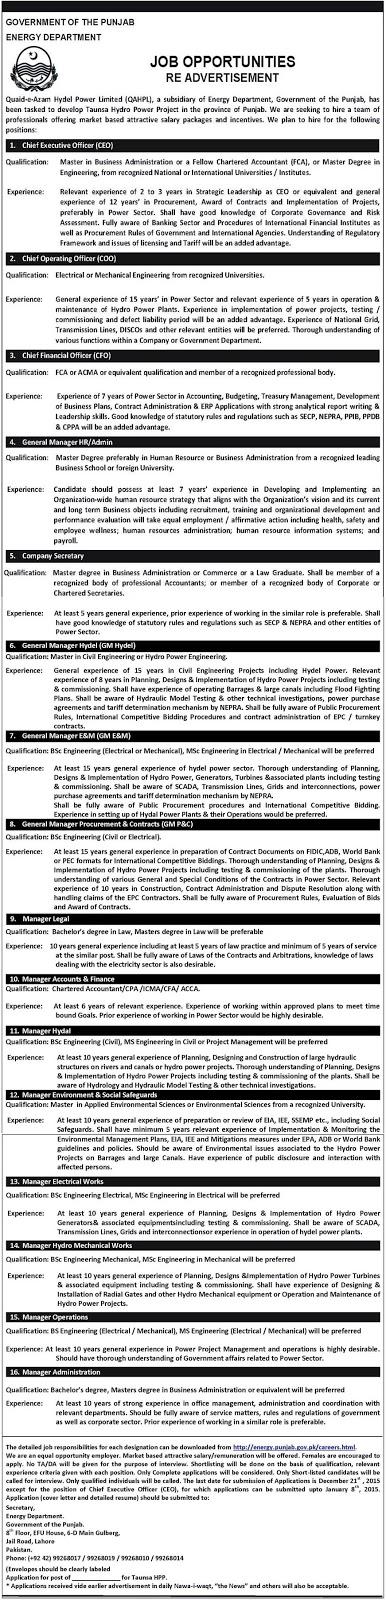 Jobs in Quaid-e-Azam Hydel Power Limited Pakistan